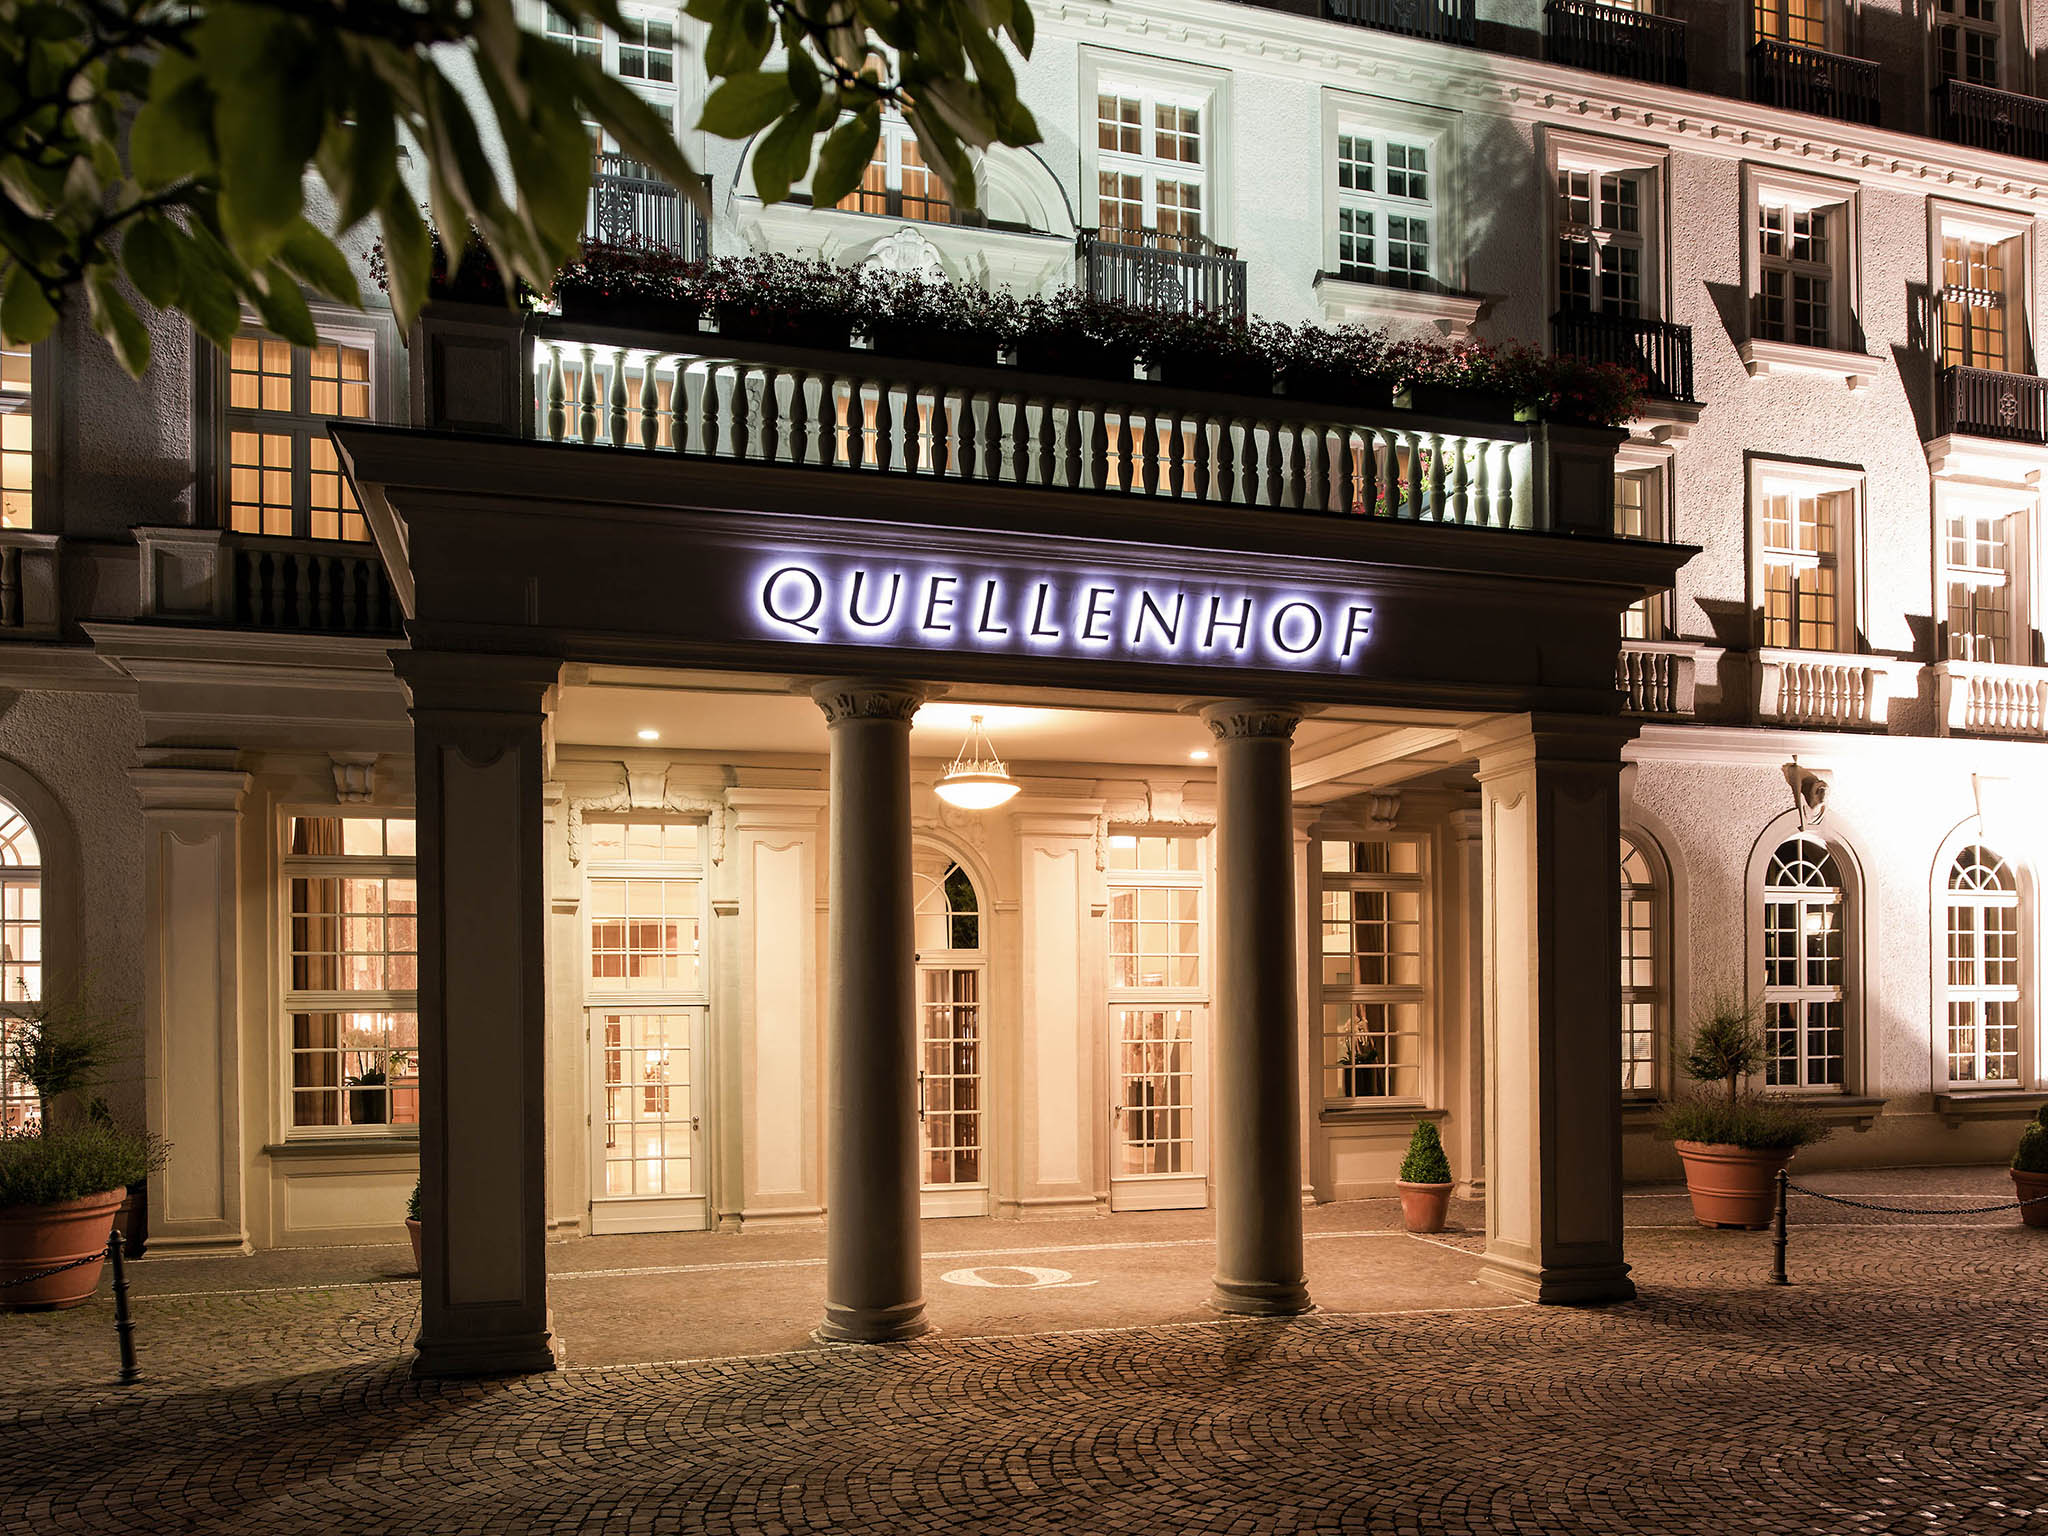 Hotel - Pullman Aachen Quellenhof